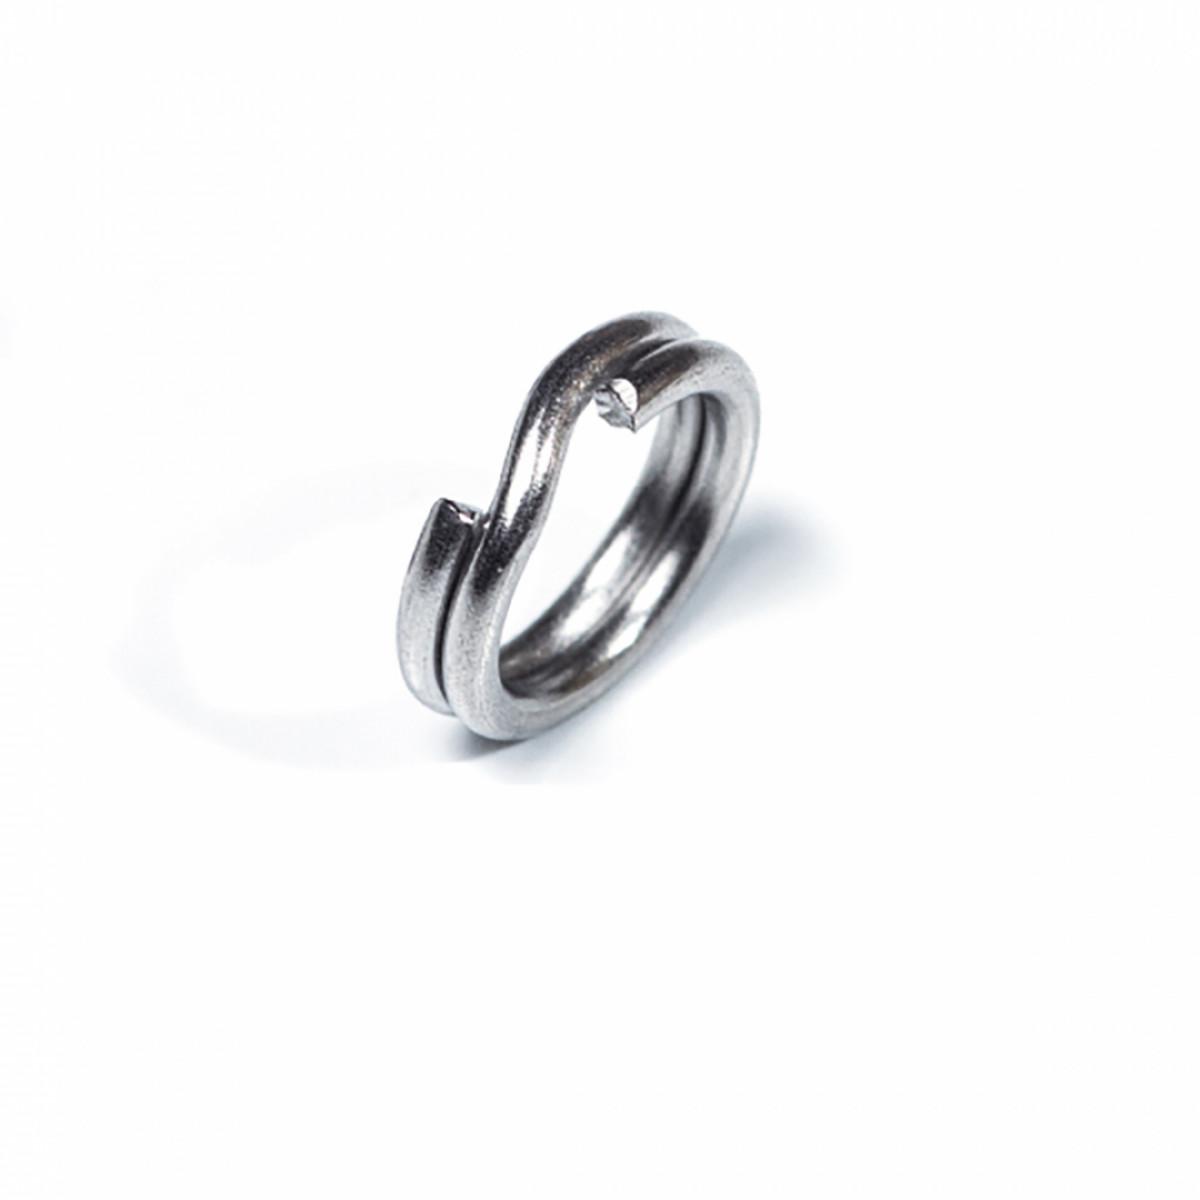 MOLIX STAINLESS SPLIT RING